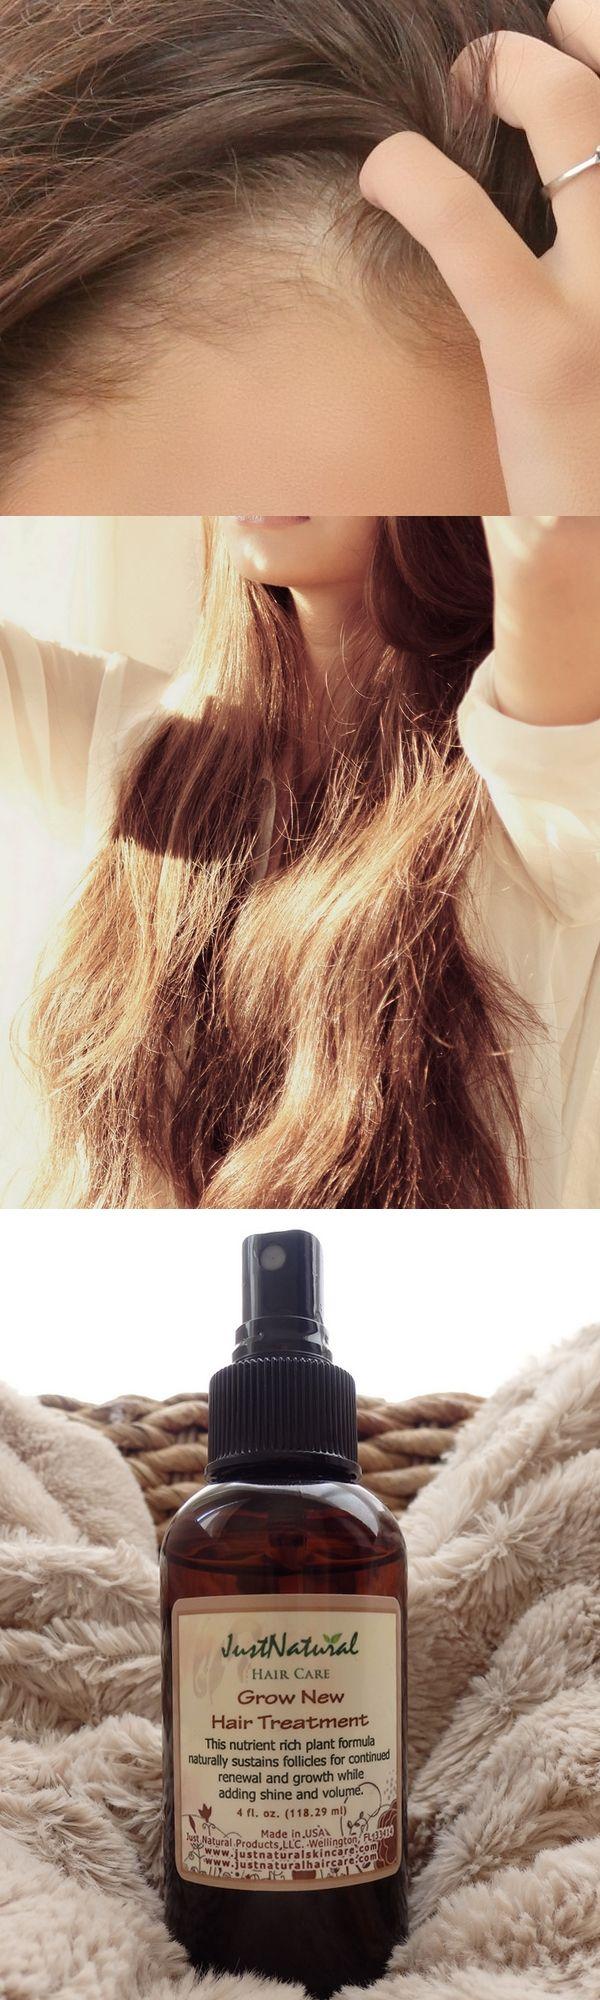 best hairuc images on pinterest hair makeup beauty tutorials